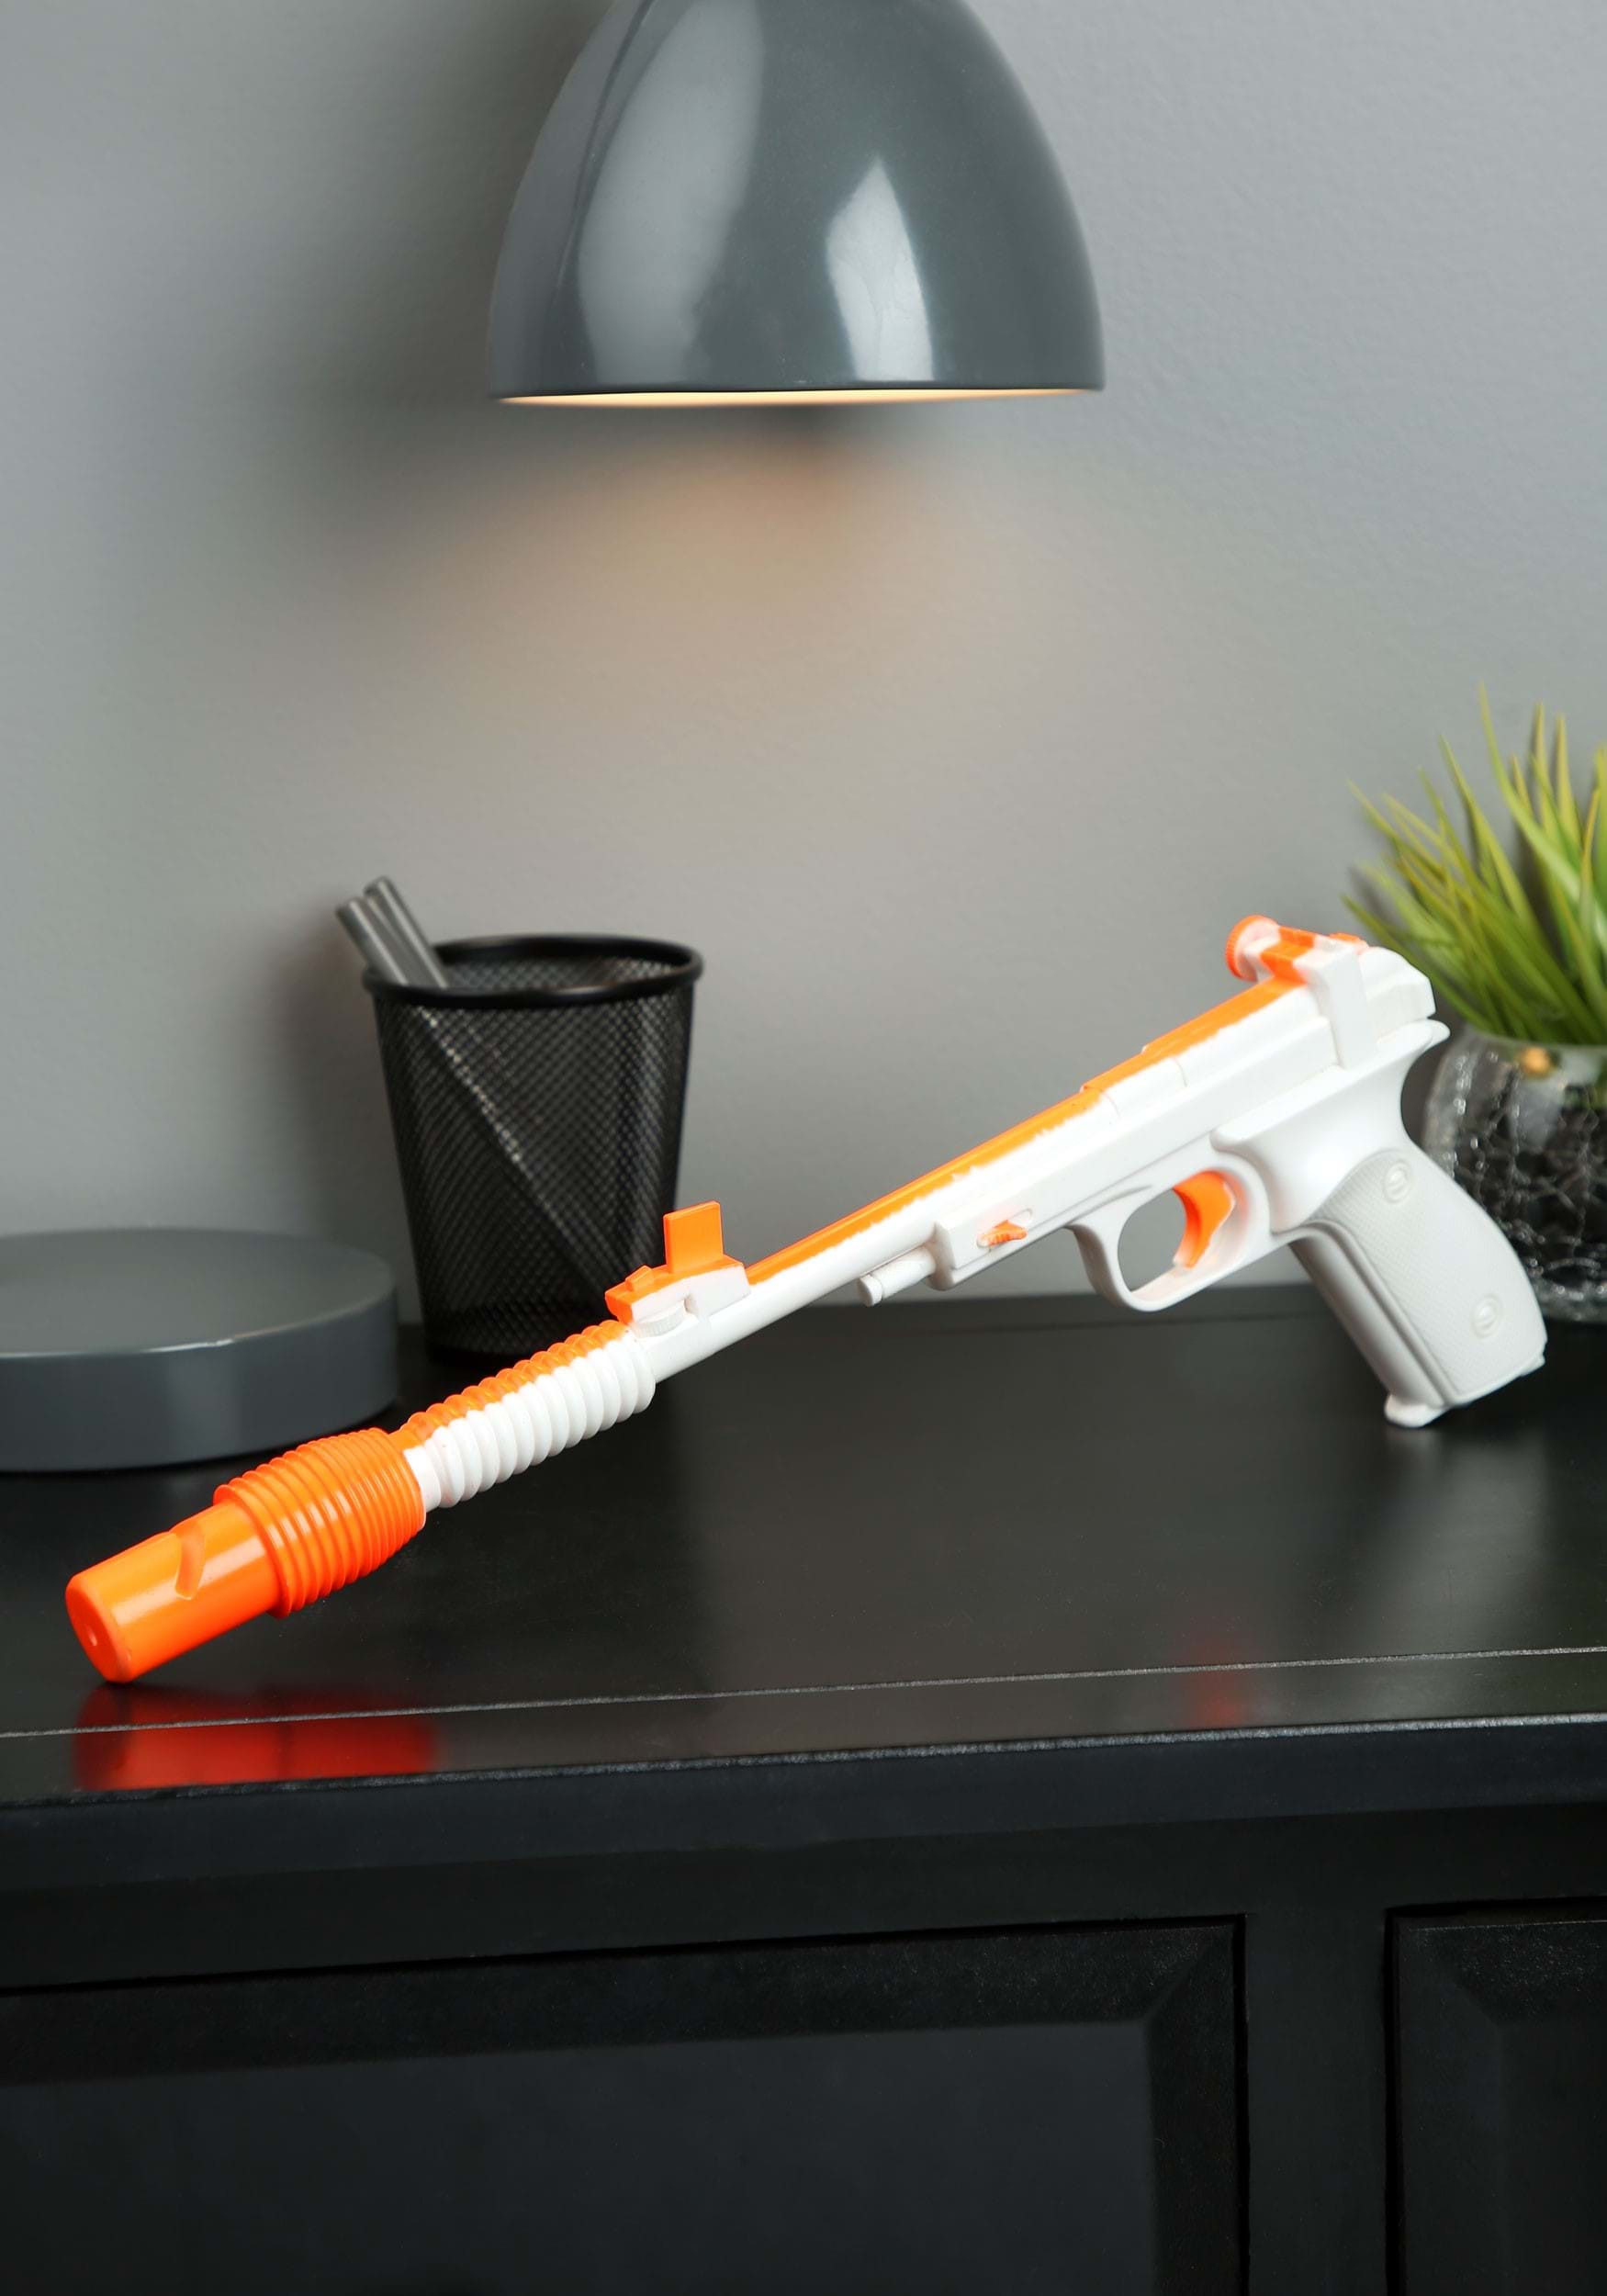 Star Wars Toy Guns : Princess leia blaster from star wars